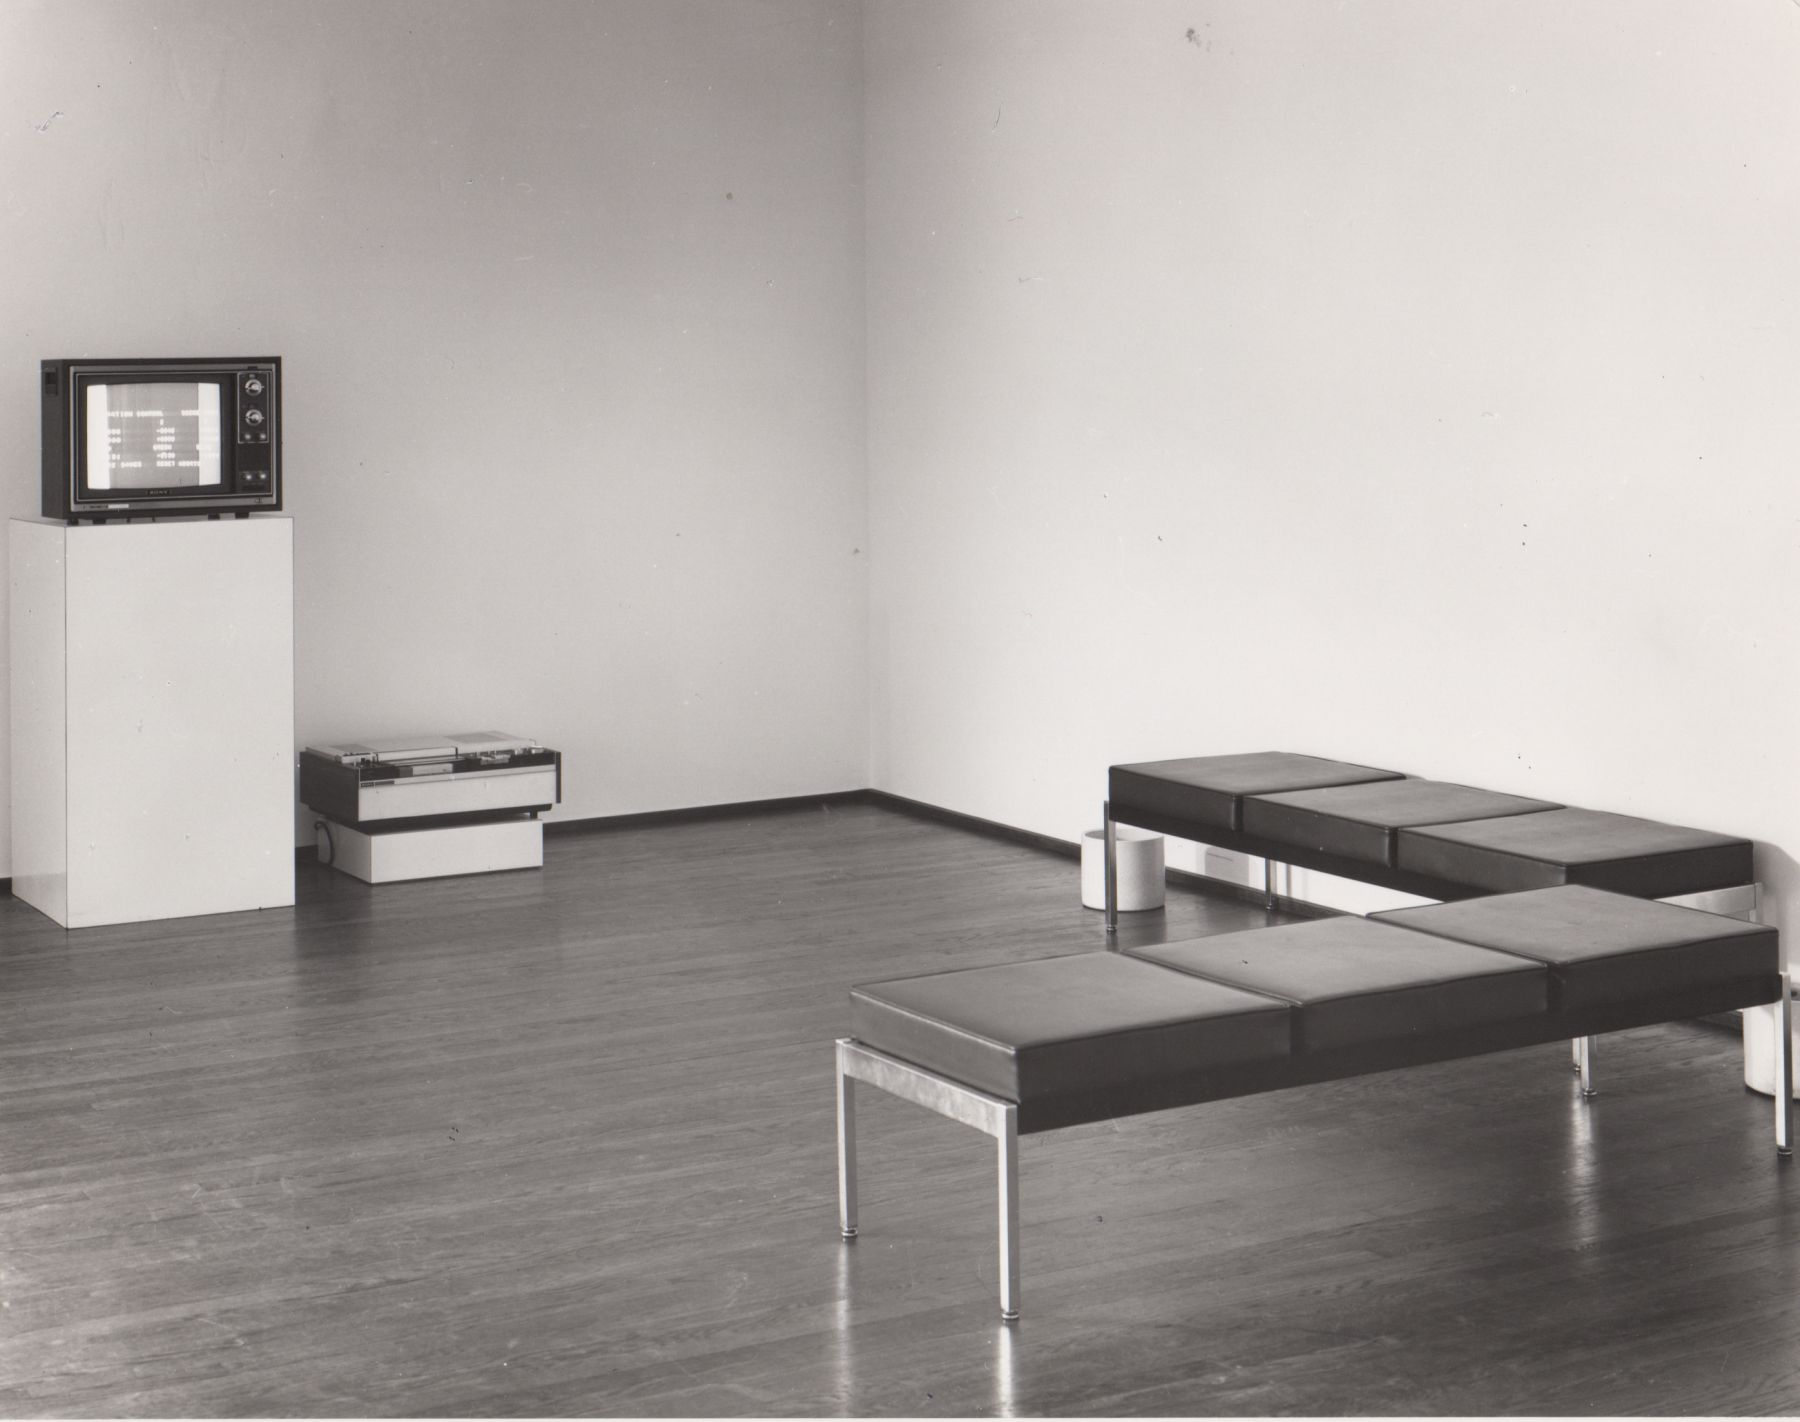 Installation view, Keith Sonnier: Radio Mix, 420 WEST BROADWAY